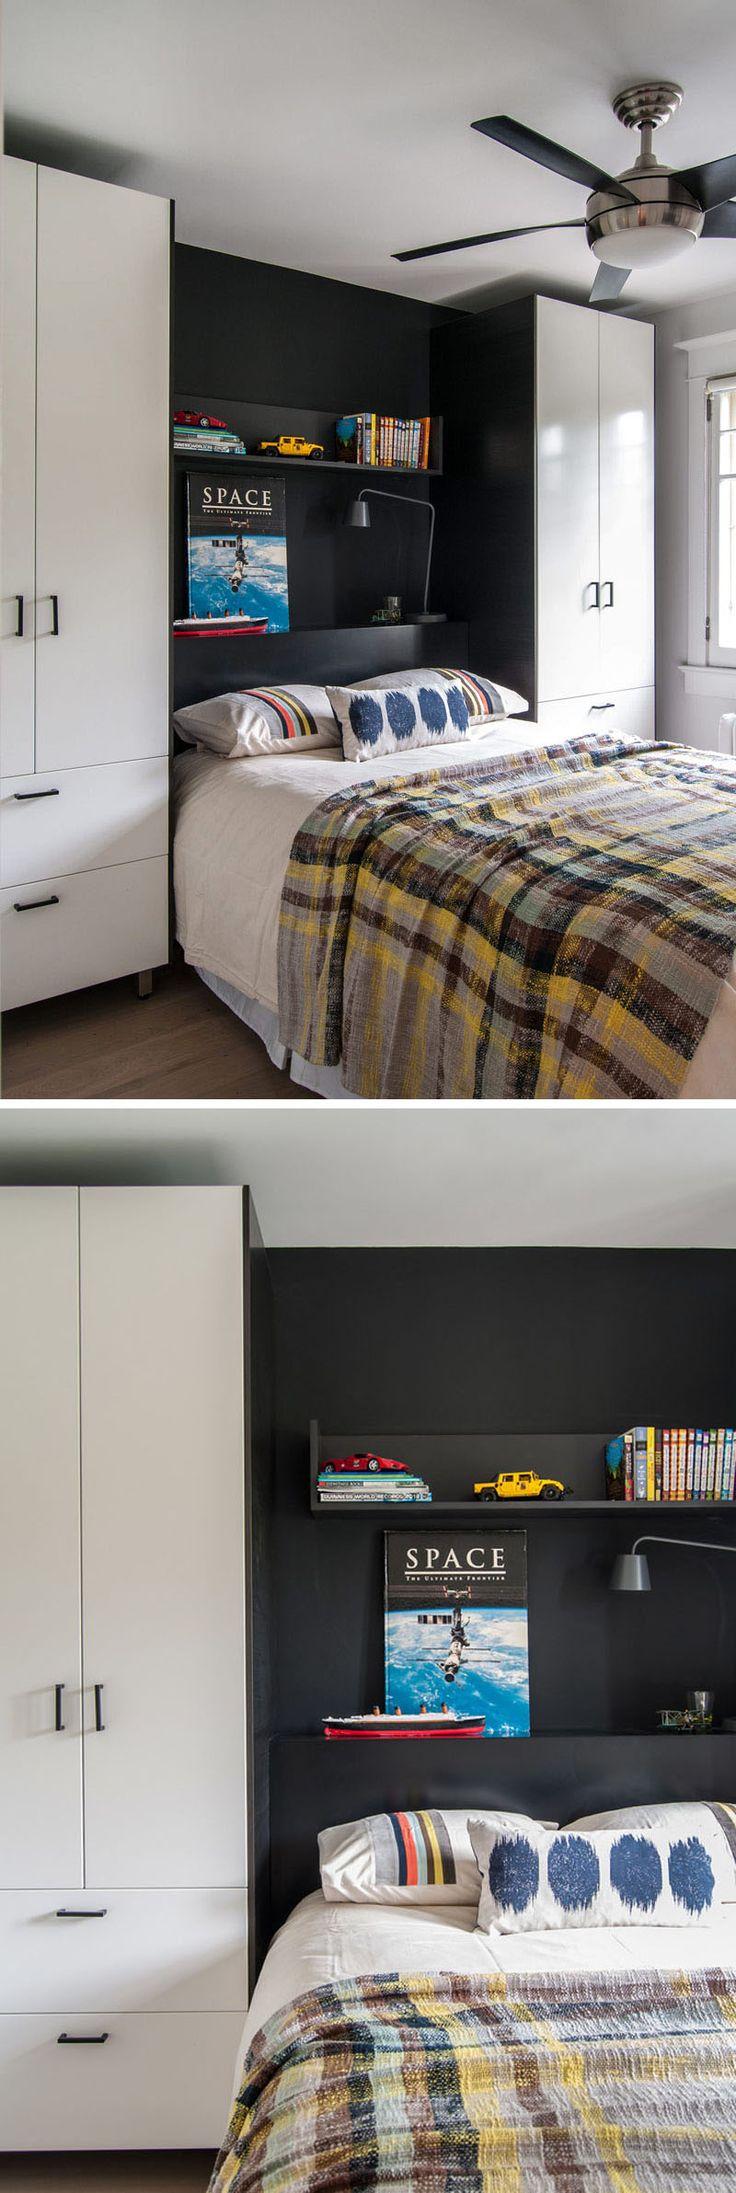 106 best MUEBLES QUE AHORRAN ESPACIO images on Pinterest | Bedroom ...